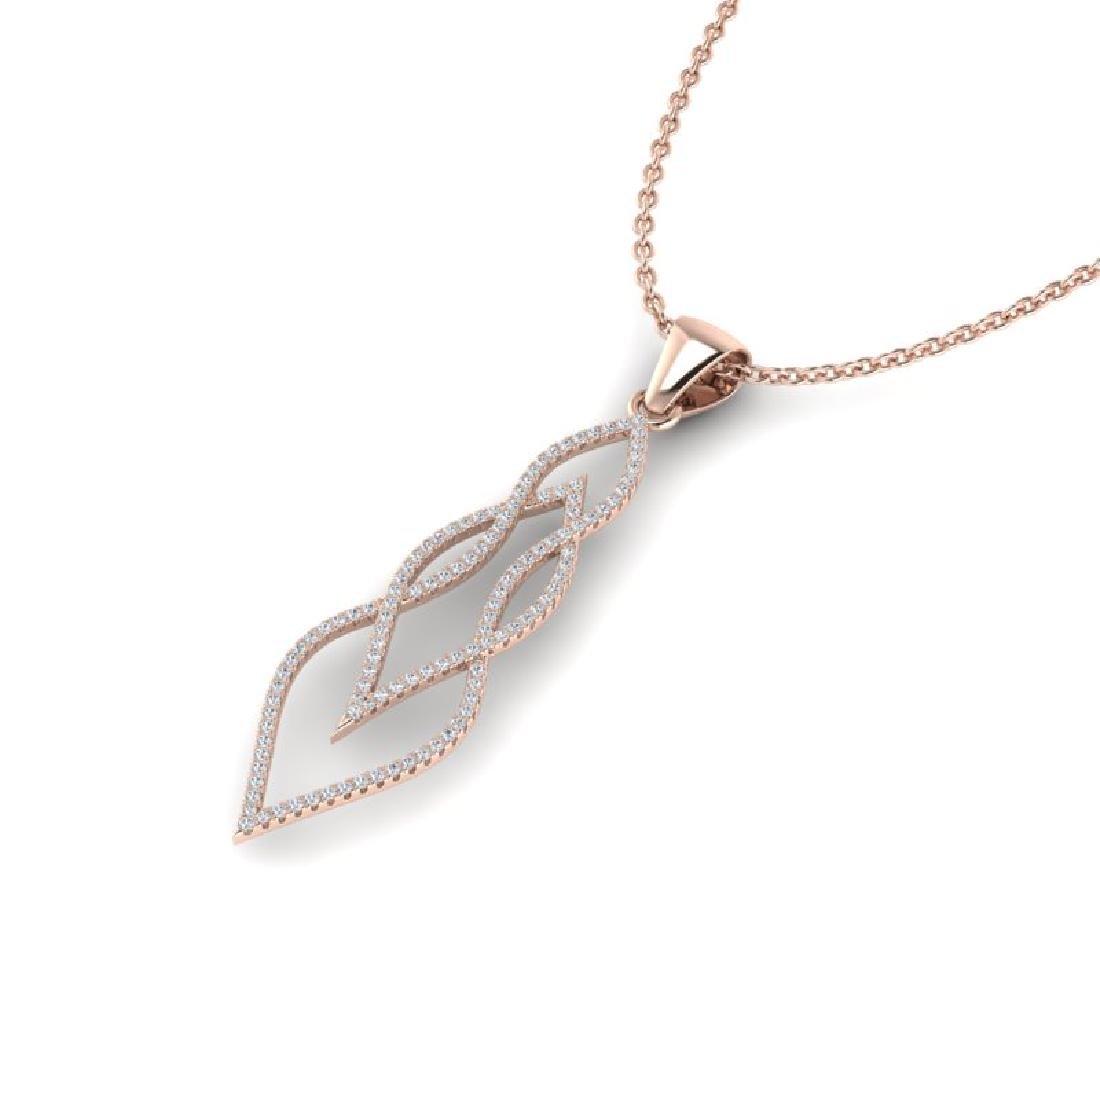 0.80 CTW Micro Pave VS/SI Diamond Necklace 14K Rose - 2